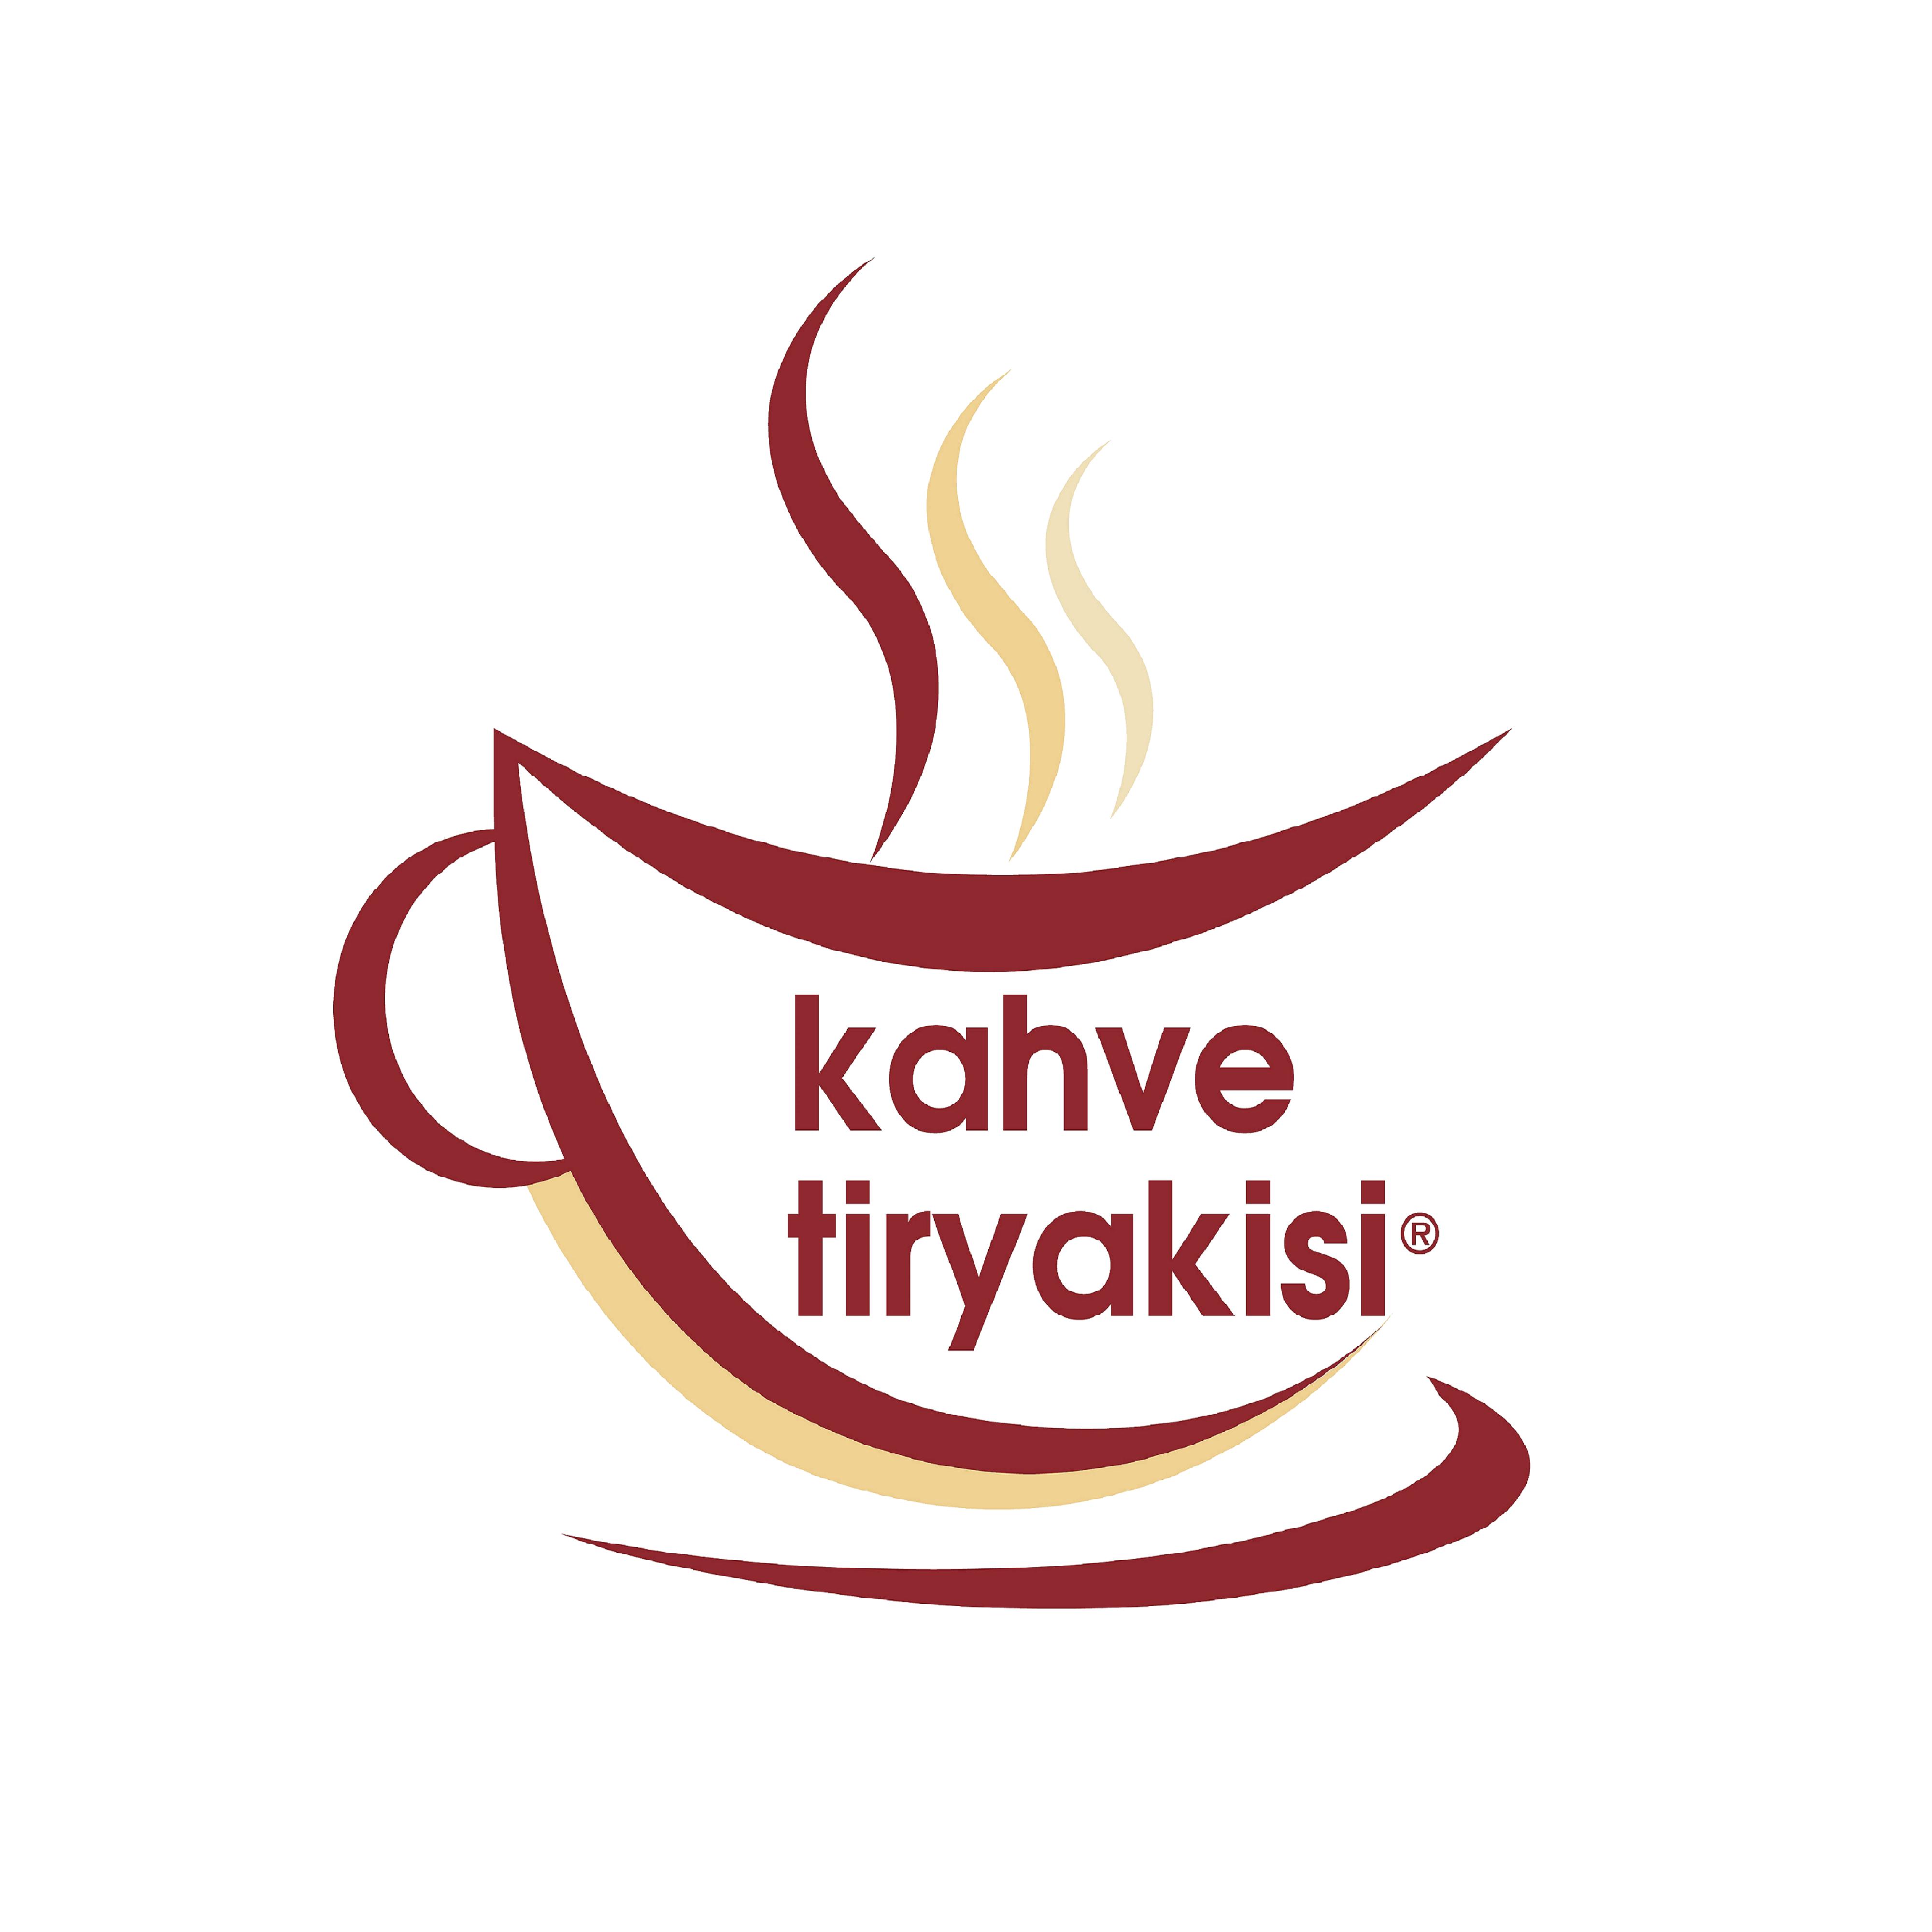 Kahve Tiryakisi